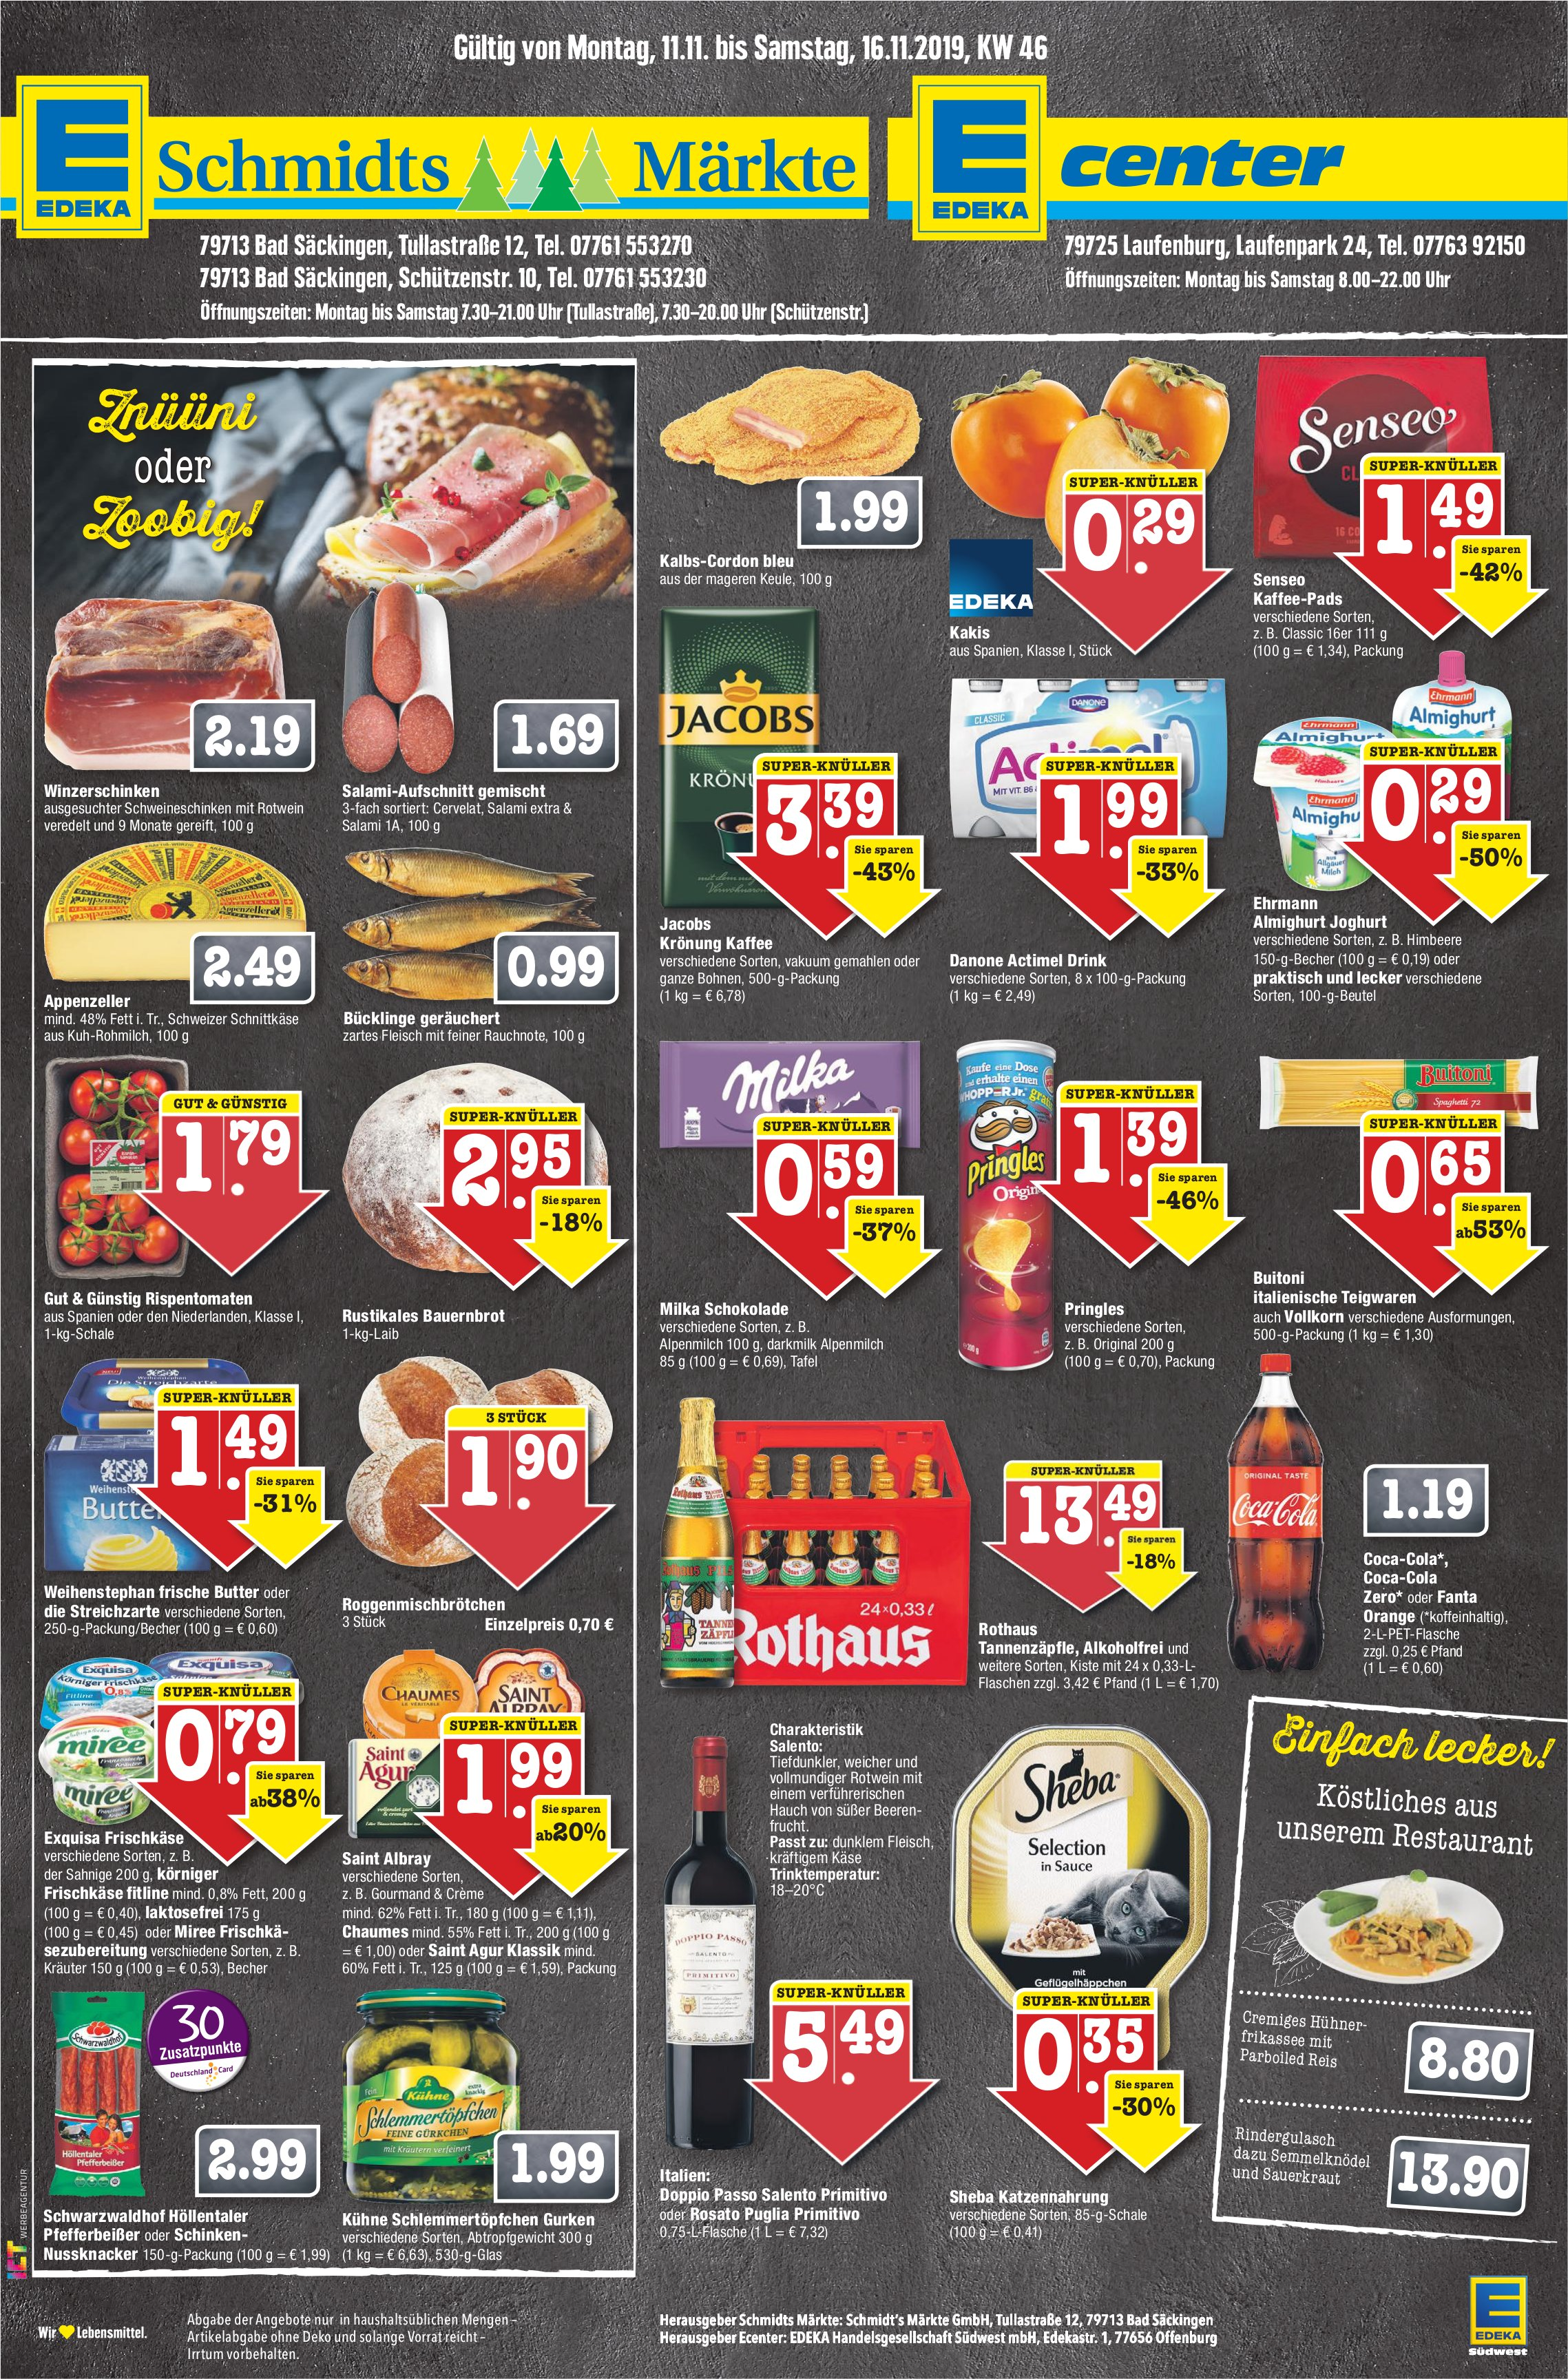 EDEKA Schmidts Märkte/EDEKA Center - Angebote vom 11 bis 16. November